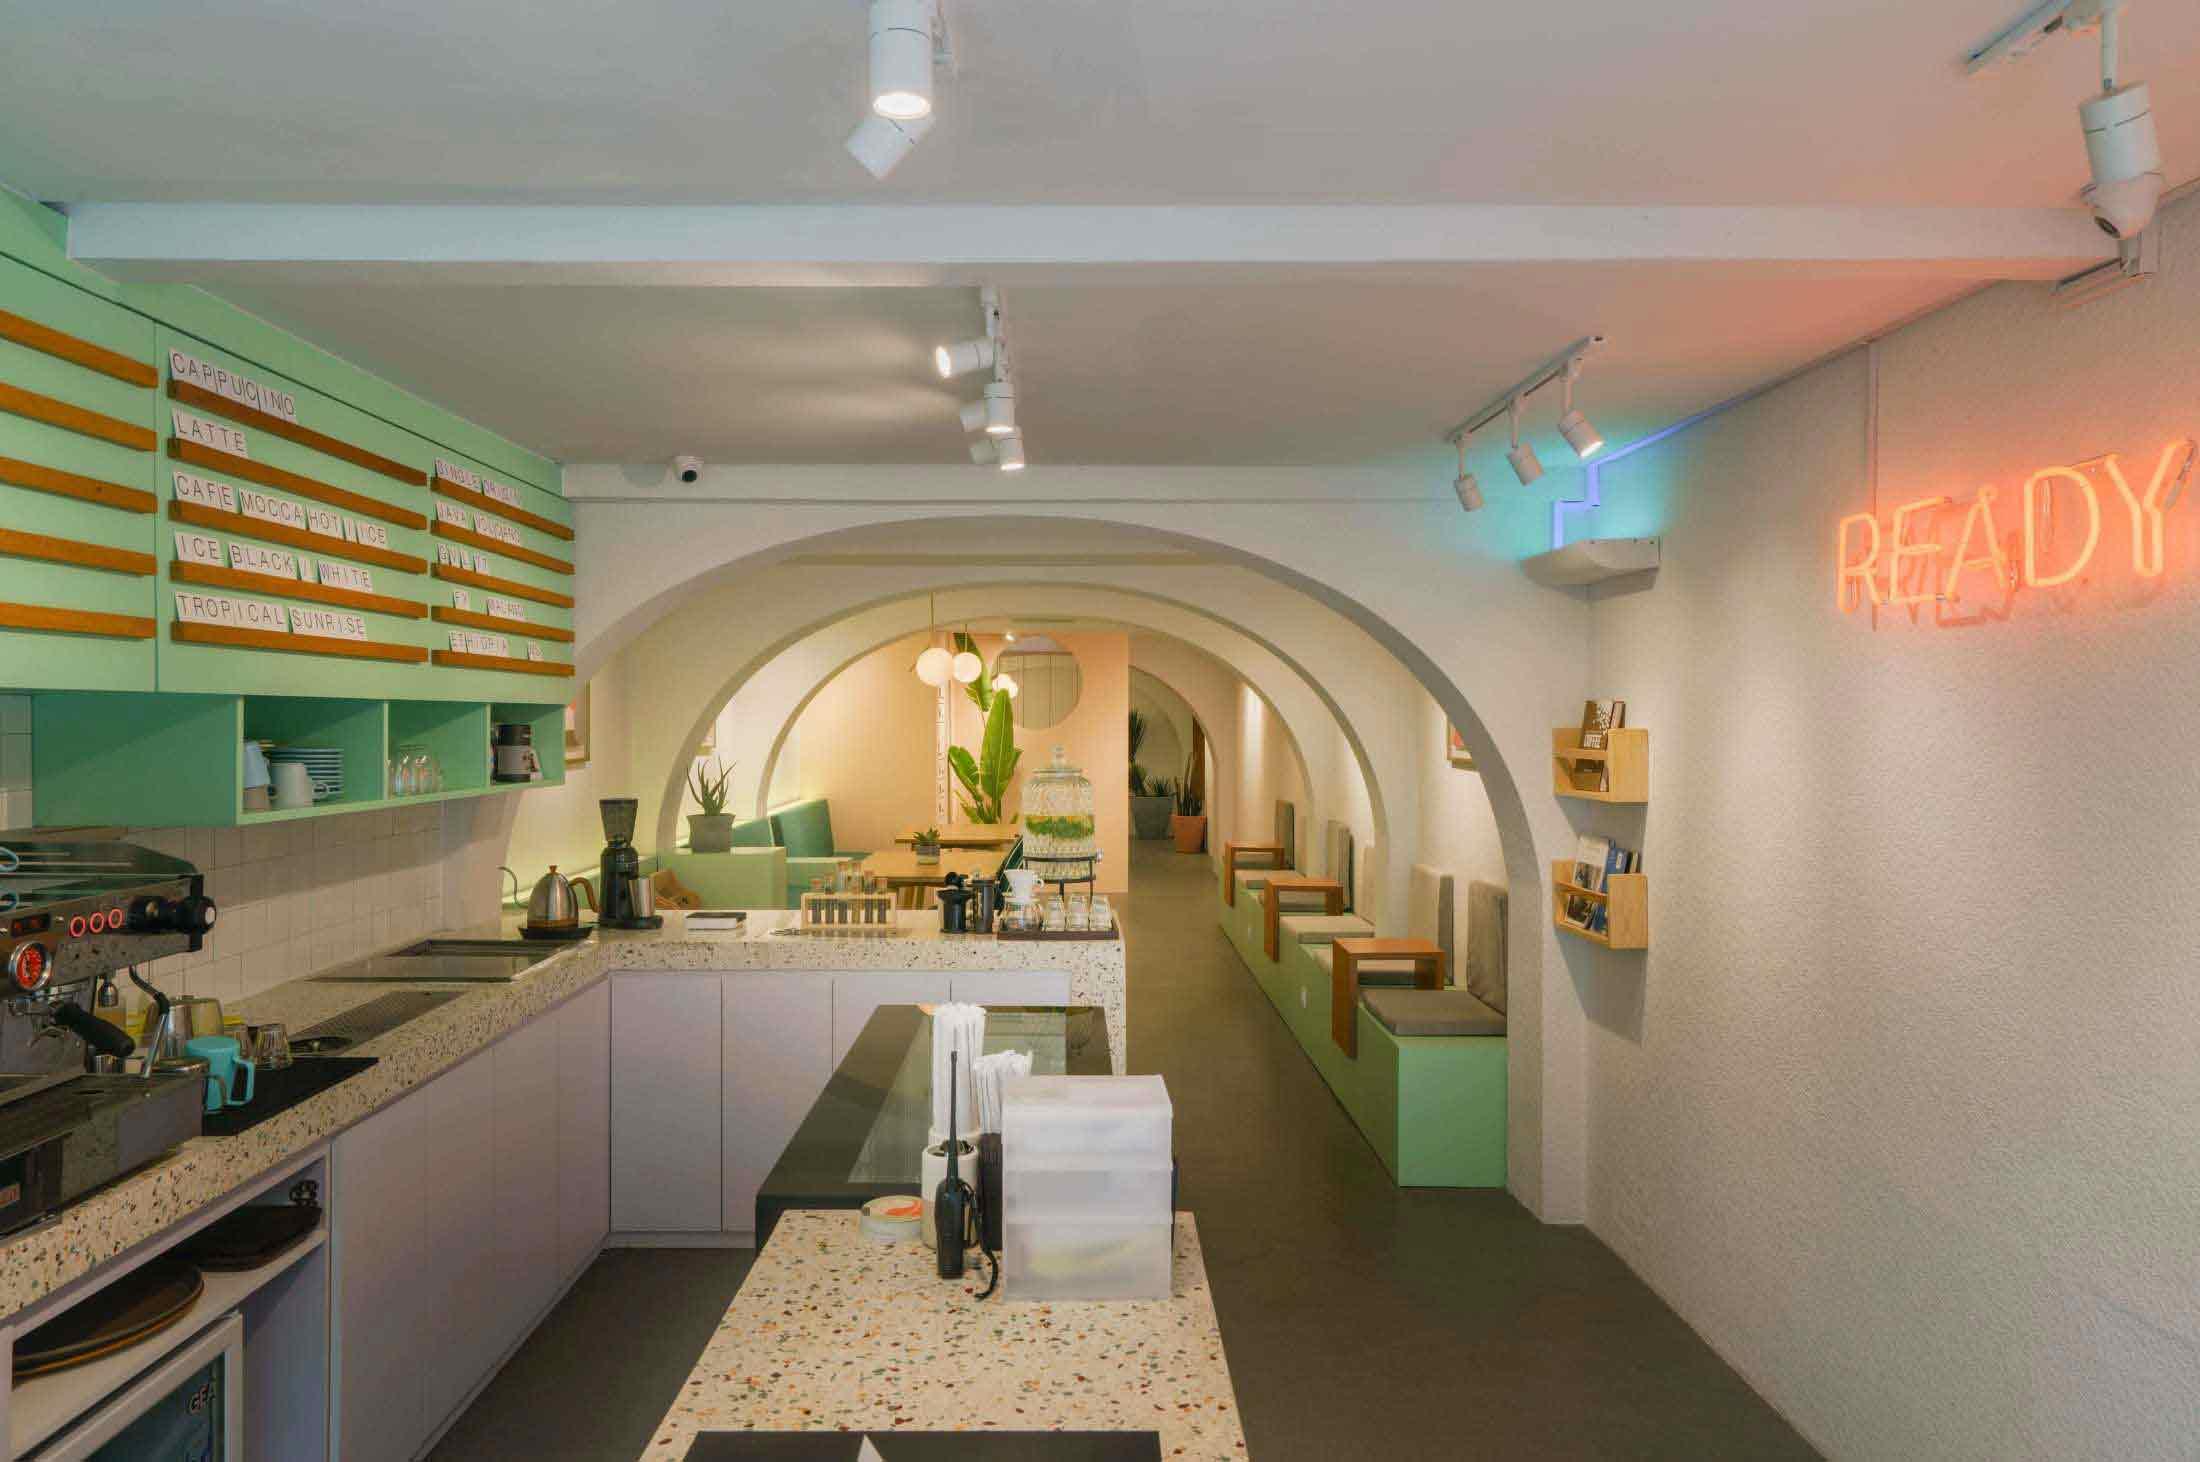 Desain Coffee Shop Kekinian Super Imut dan Instagrammable Karya Interra   Foto artikel Arsitag